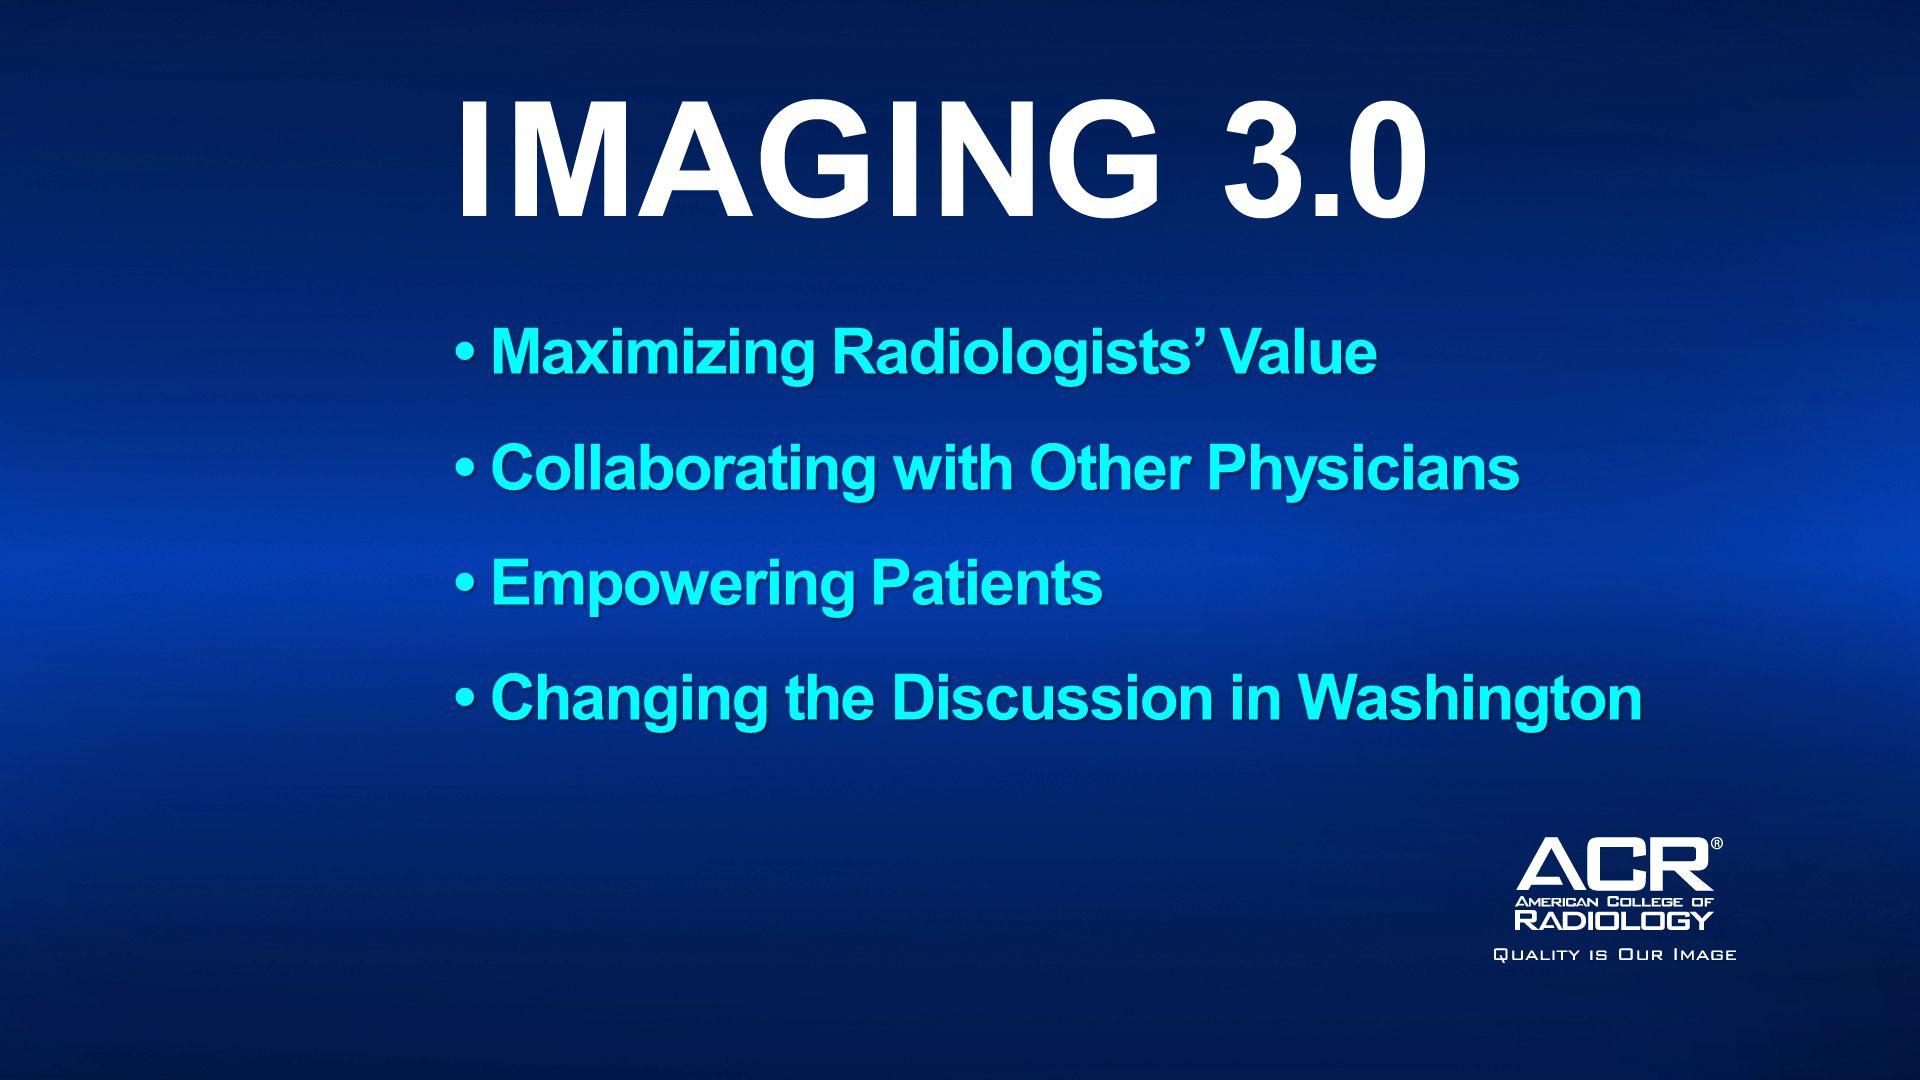 Maximizing Radiologists' Value Maximizing Radiologists' Value Collaborating with Other Physicians Collaborating with Other Physicians Empowering Patients Empowering Patients Changing the Discussion in Washington Changing the Discussion in Washington